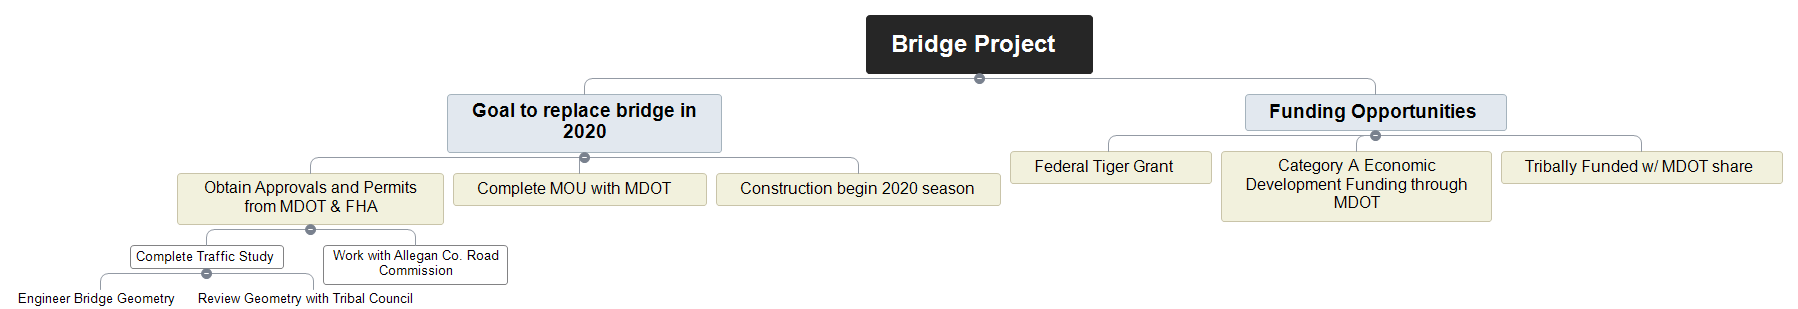 Bridge Project  Mind Map